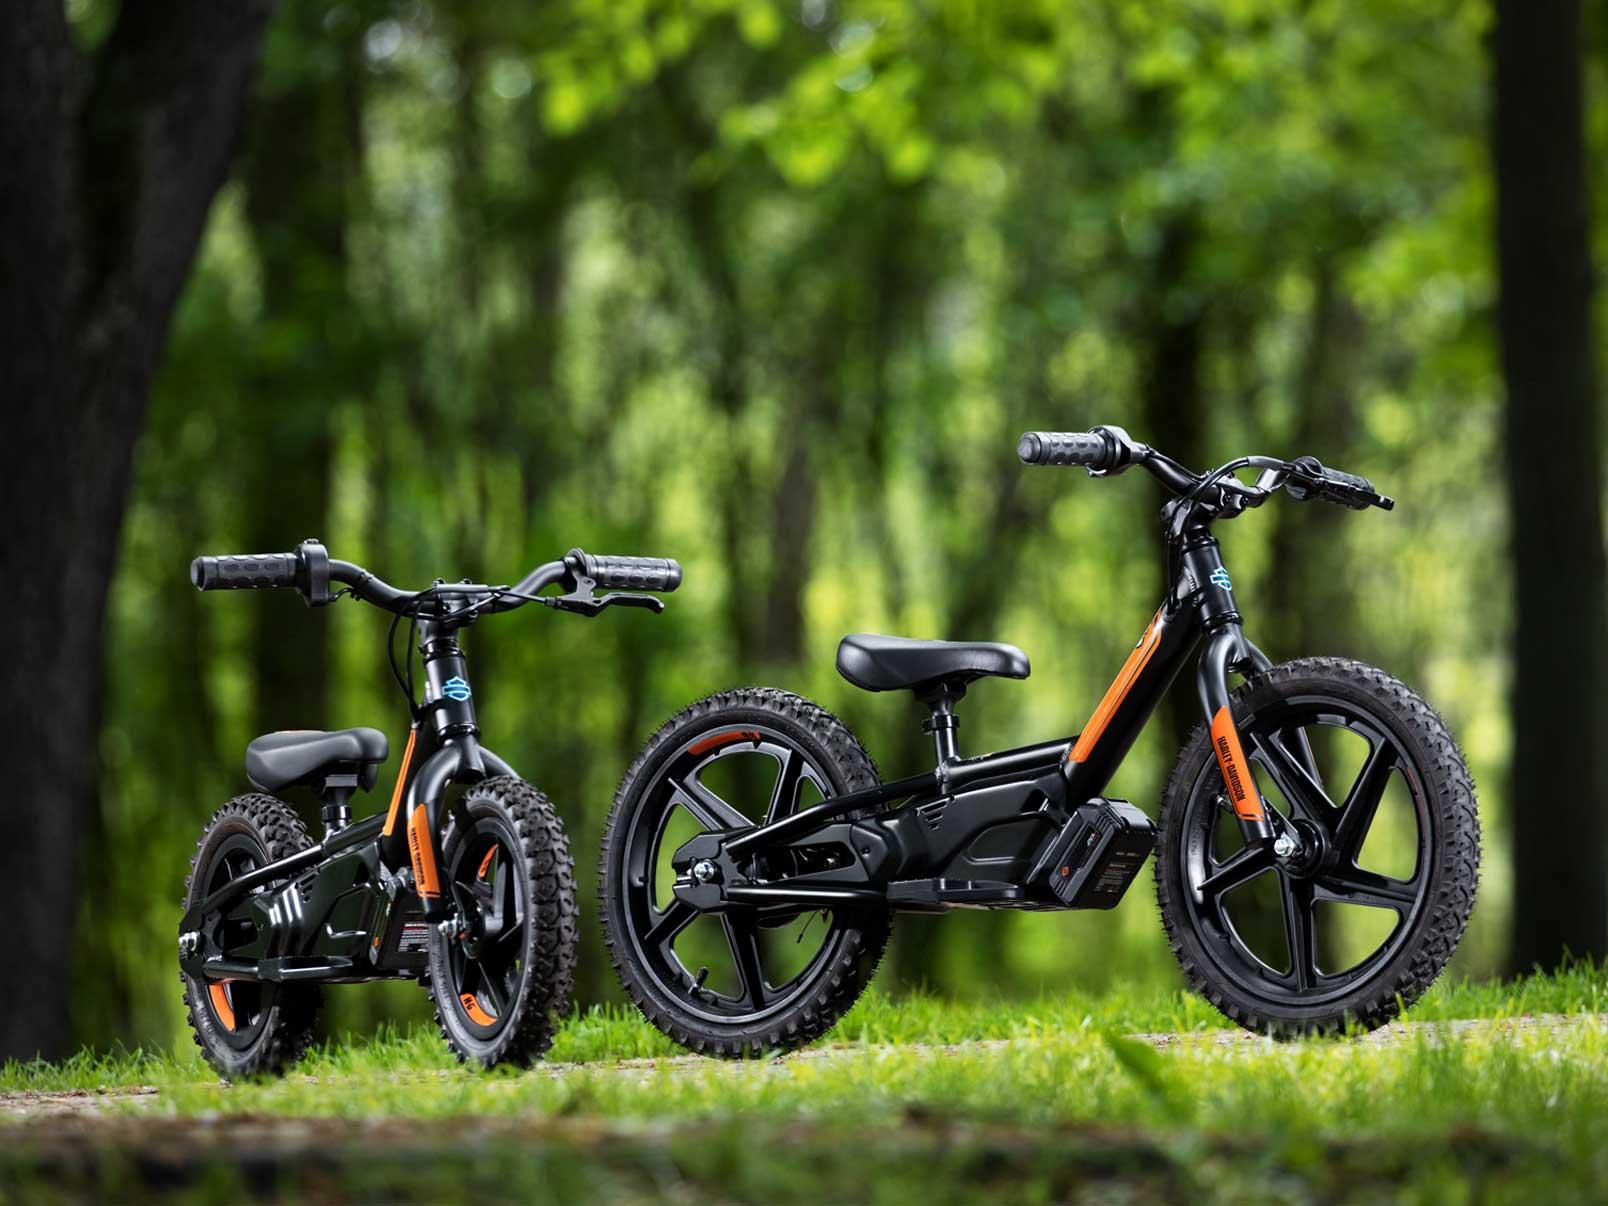 electric motorcycles harley davidson